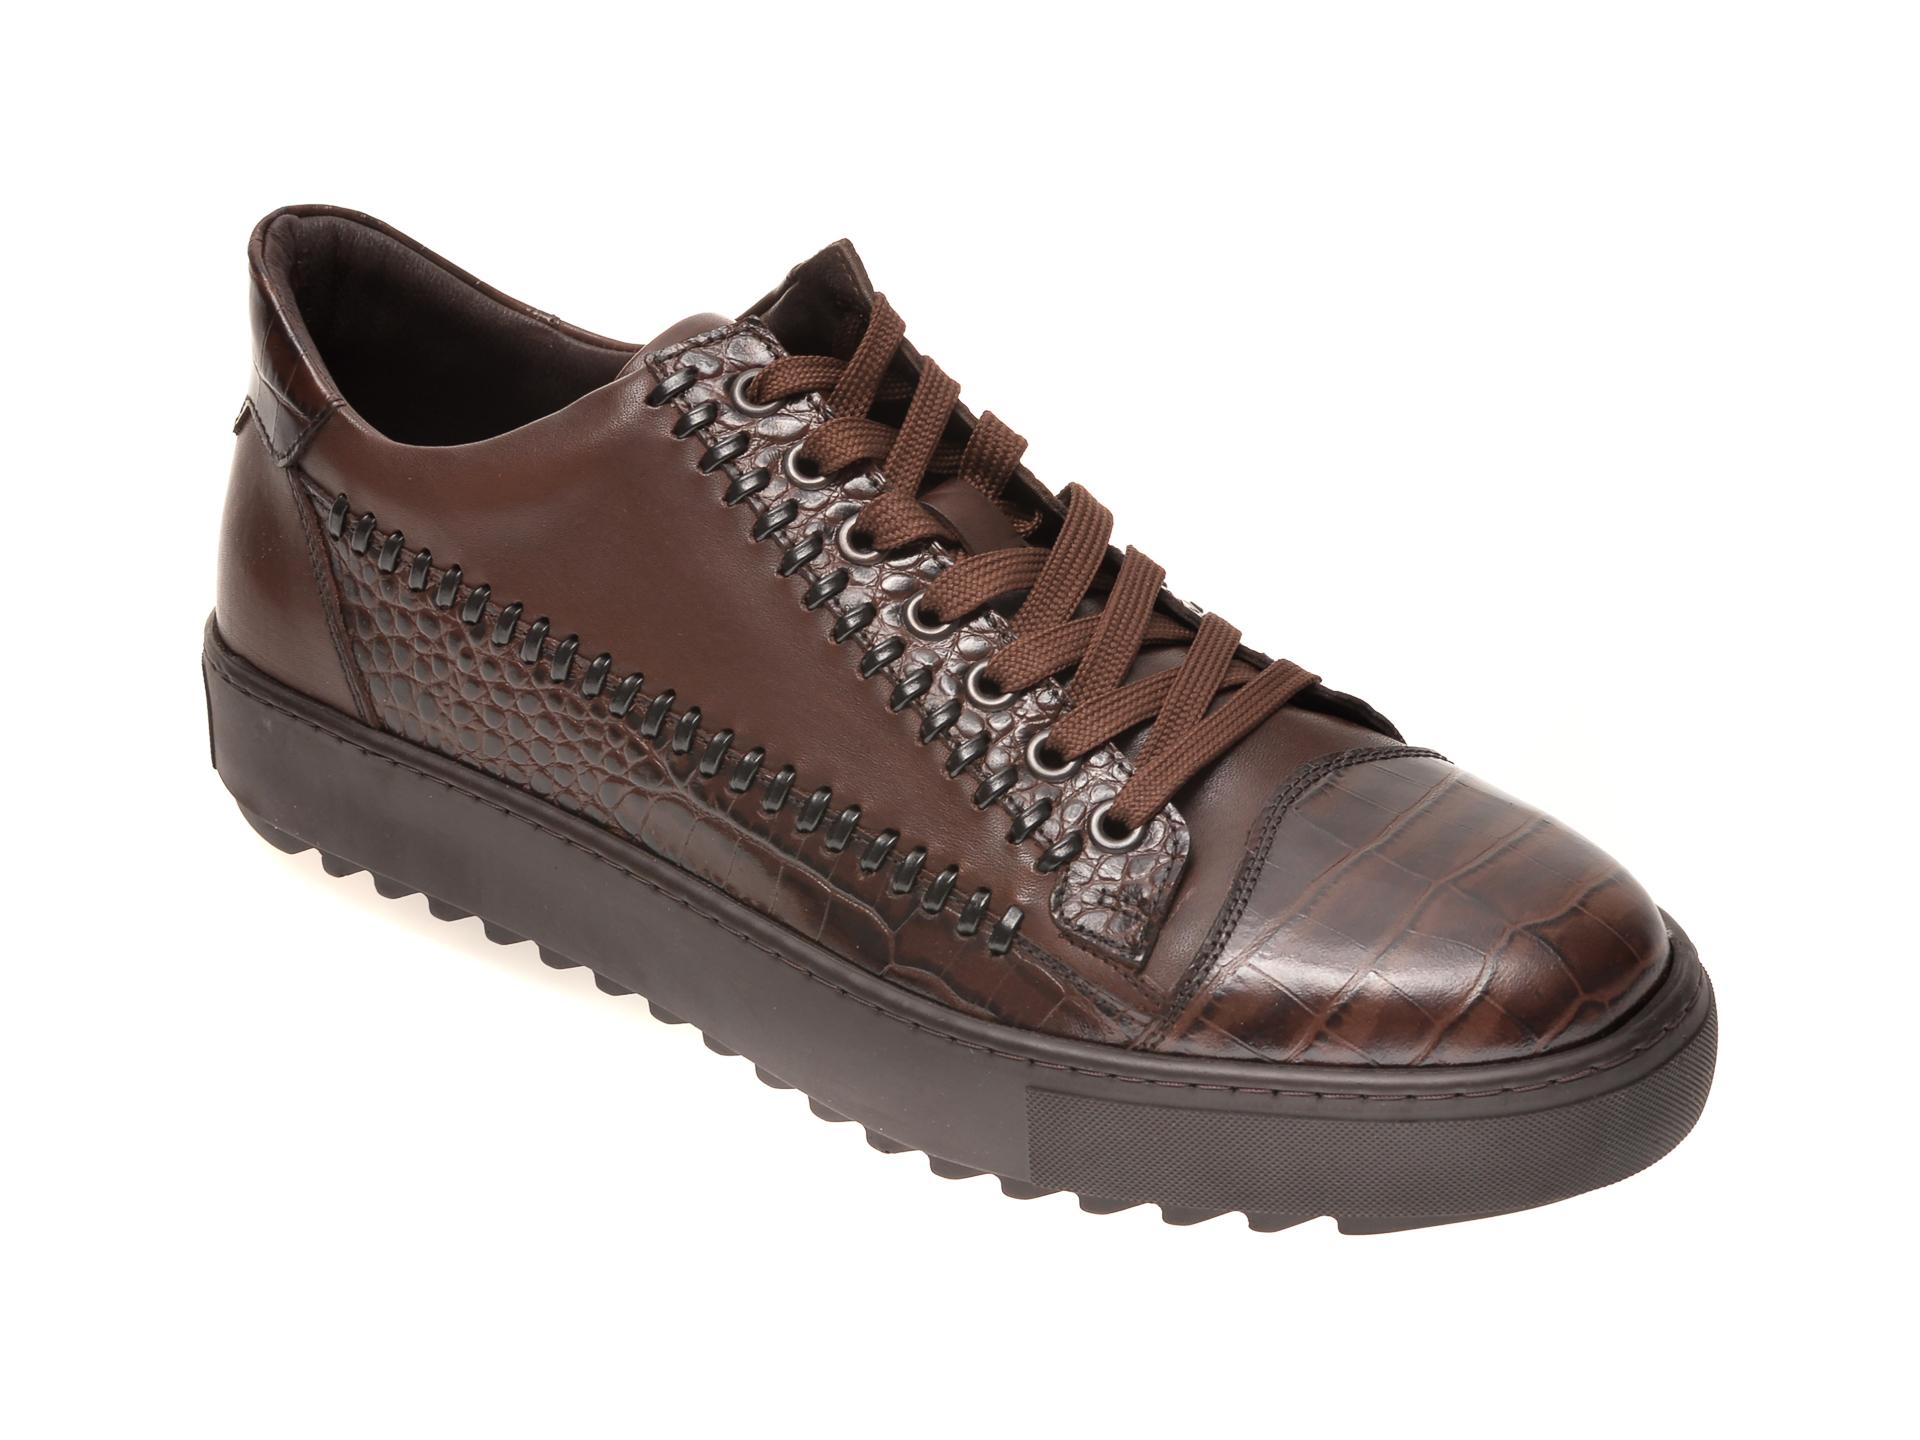 Pantofi OTTER maro, 601, din piele naturala imagine